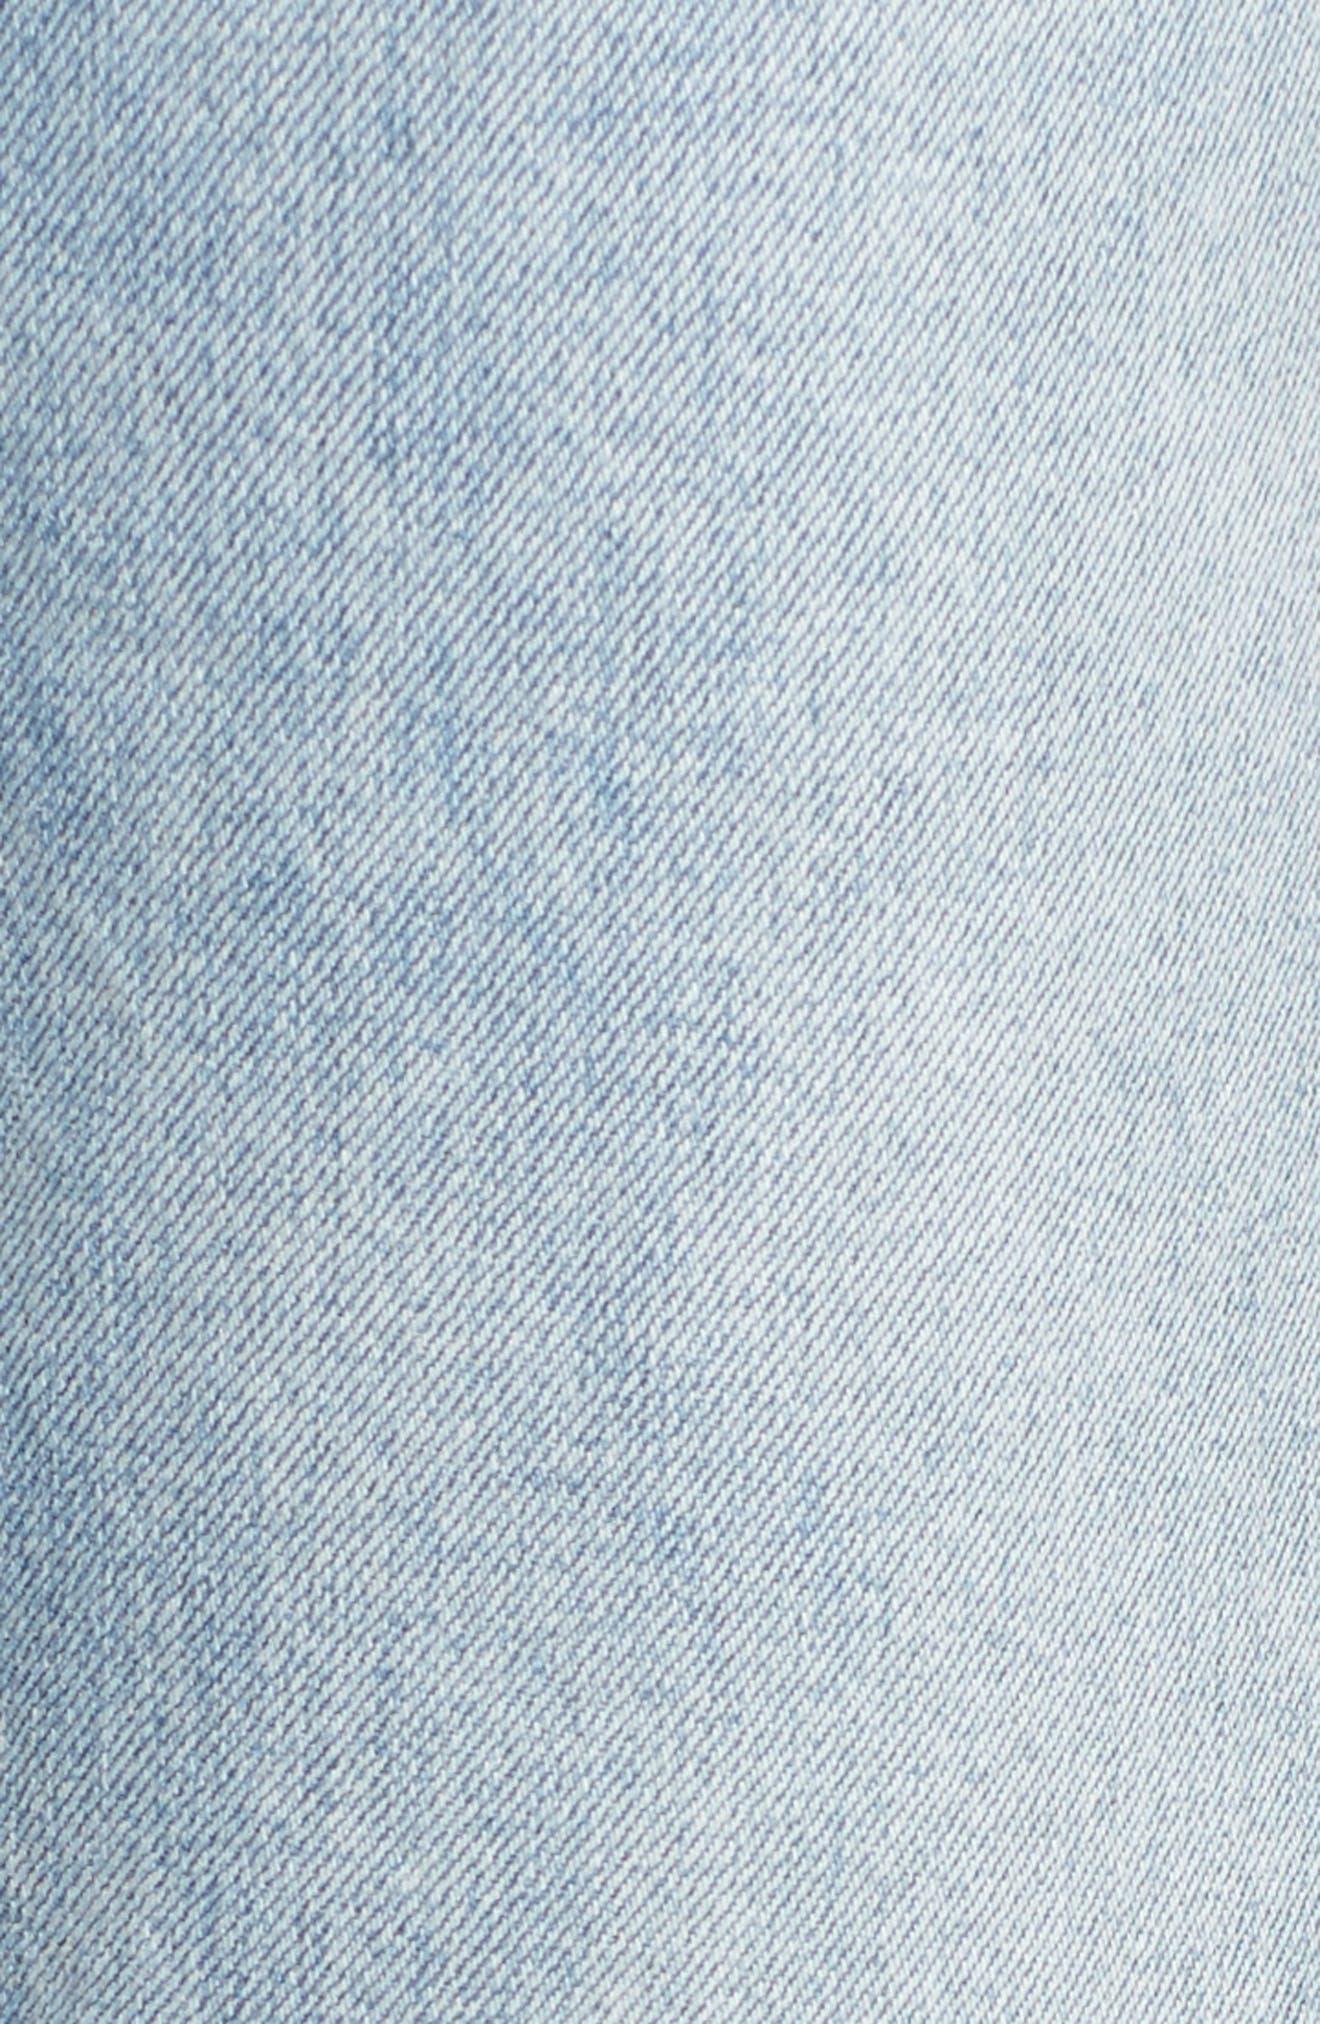 Patti Crop Straight Leg Jeans,                             Alternate thumbnail 6, color,                             430